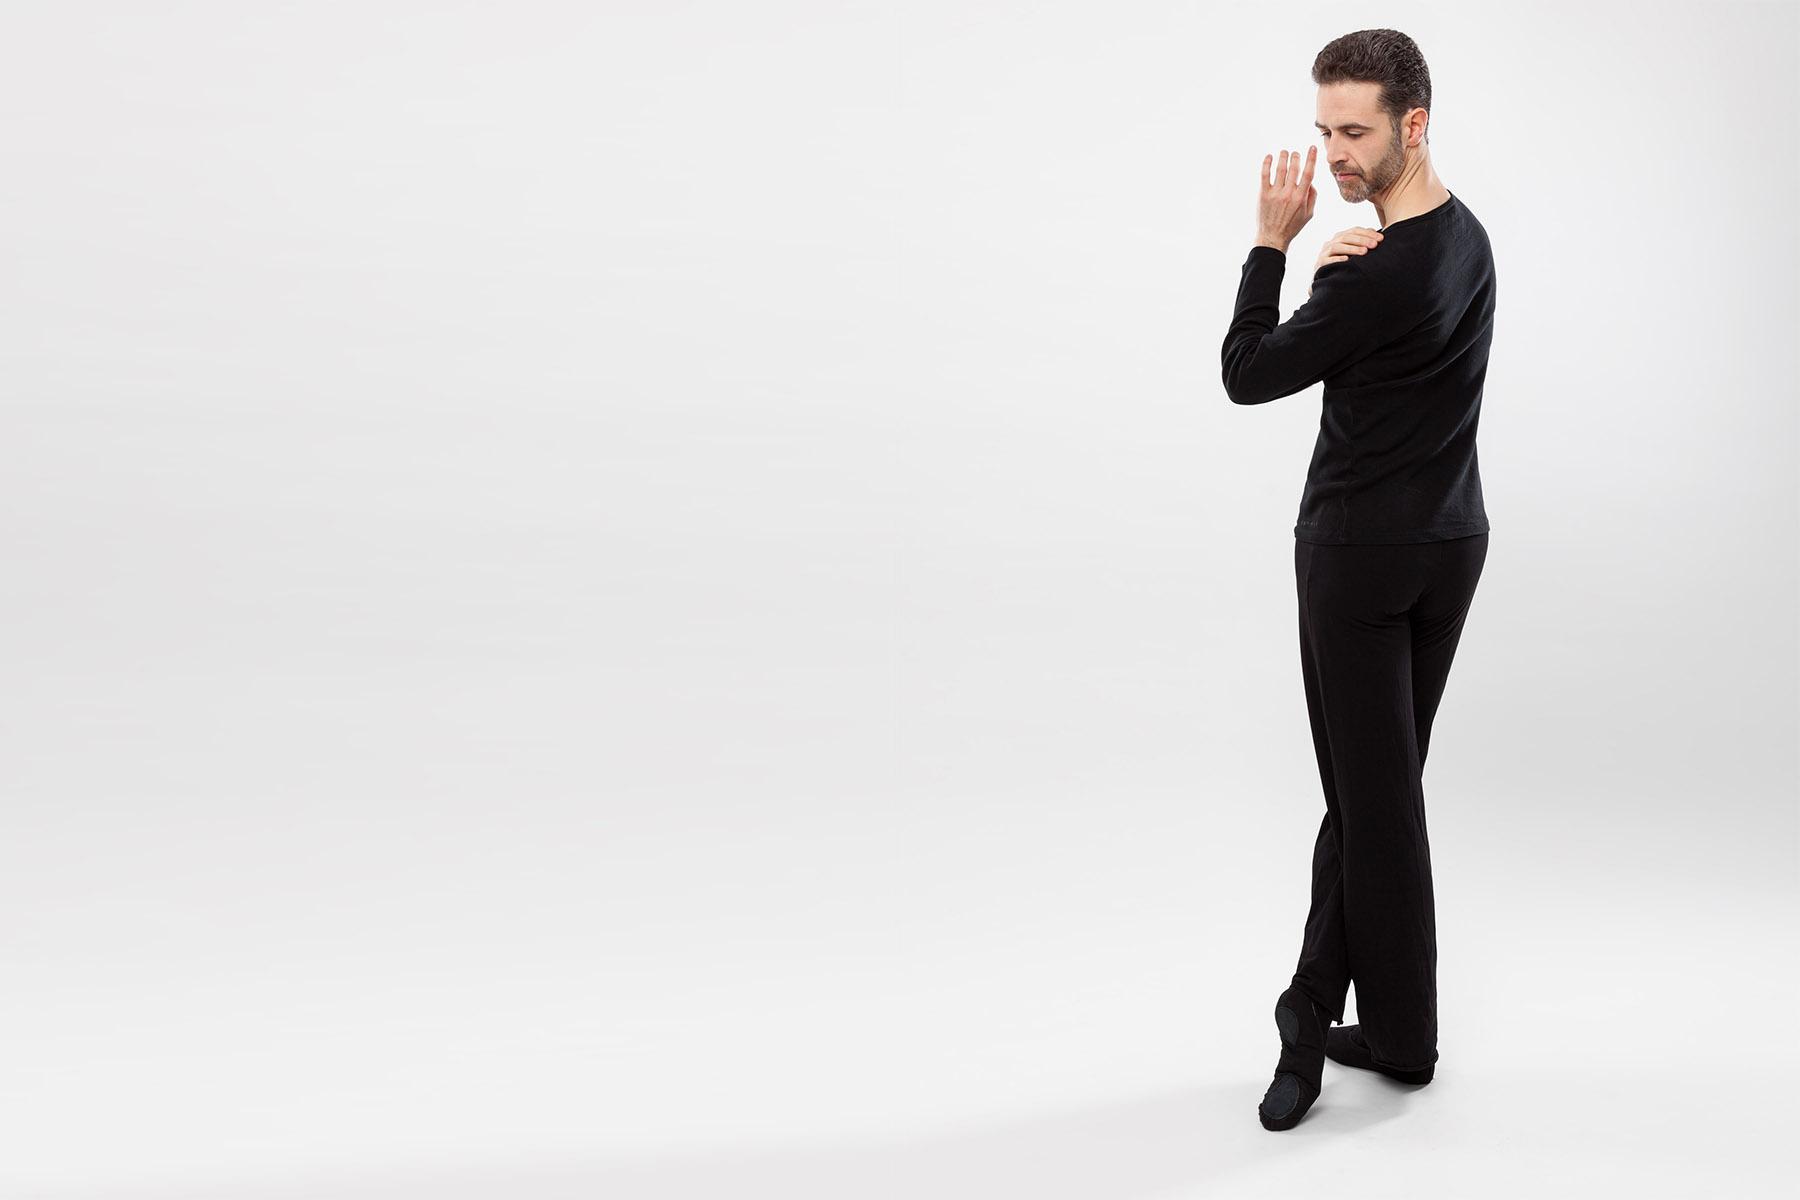 Ballett Kurs bei Adrian Navarro im motion*s in Berlin Kreuzberg